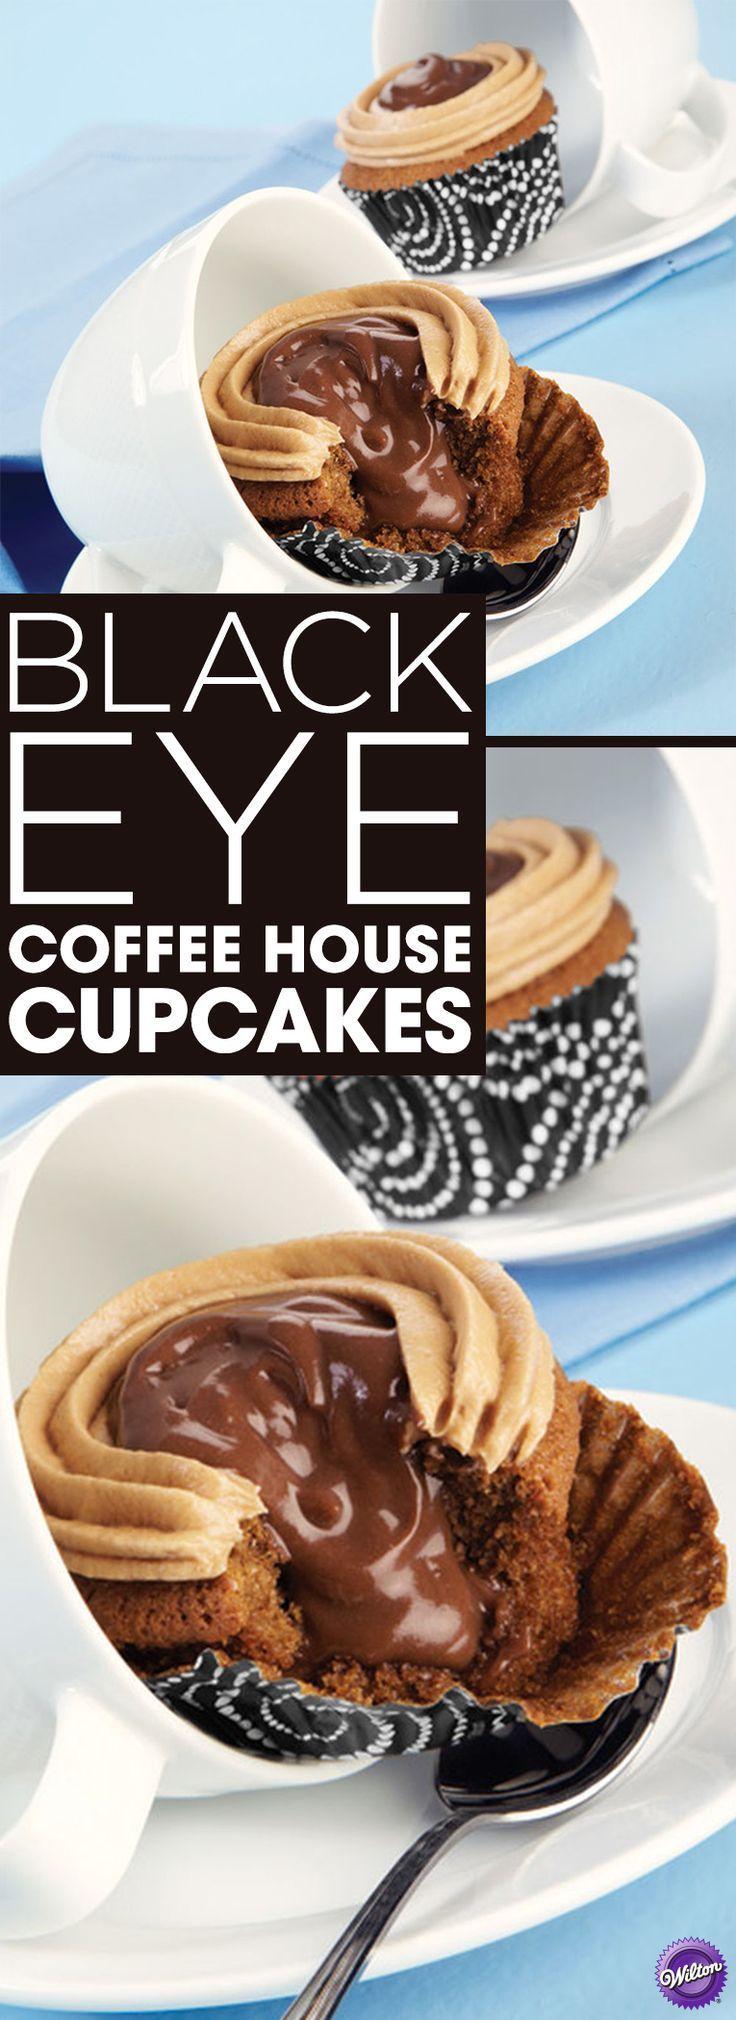 Black Eye Coffee House Cupcake Recipe If you love coffee